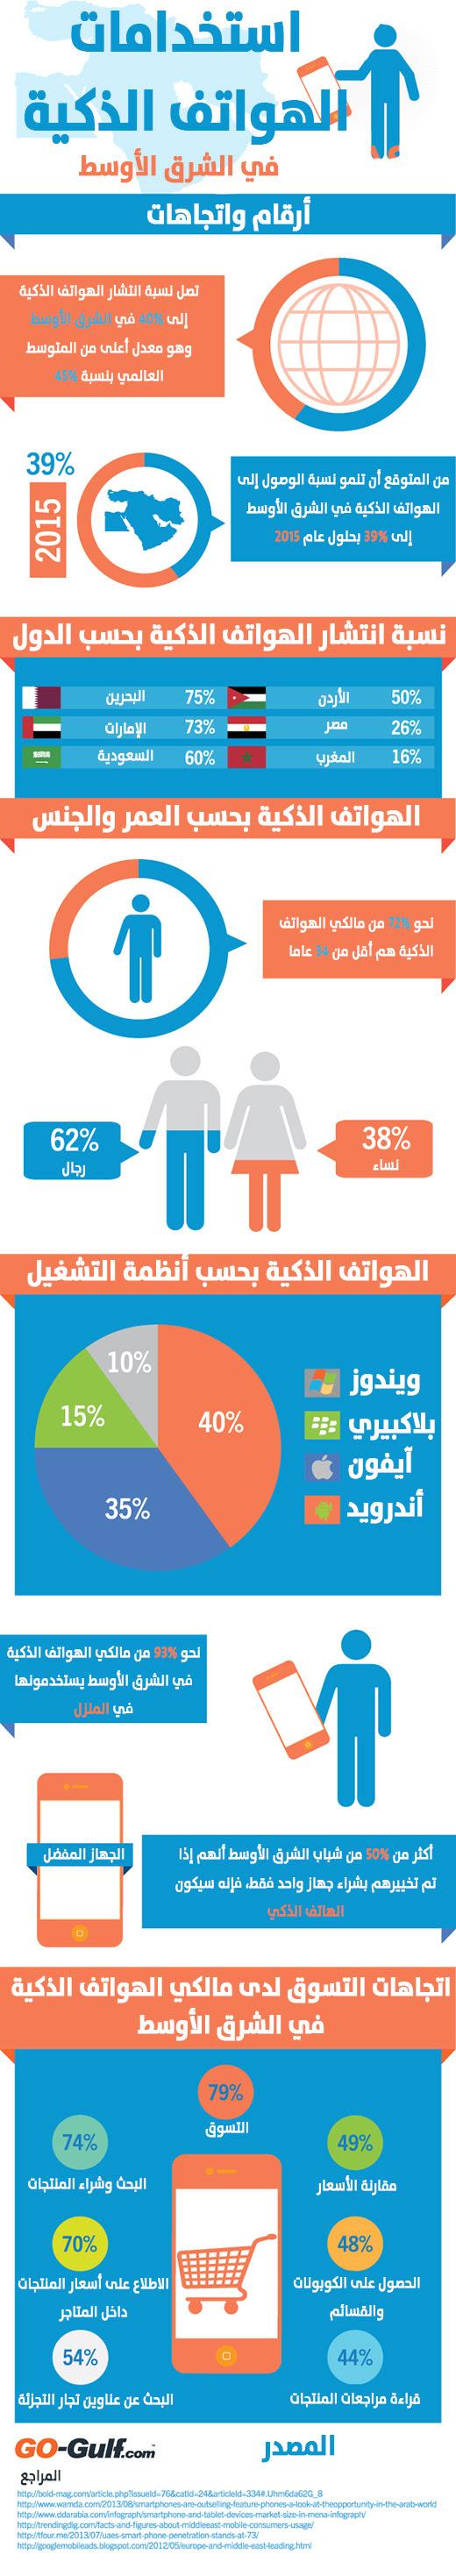 smartphone middle east arabic إنفوجرافيك: استخدام الهواتف الذكية في الشرق الأوسط